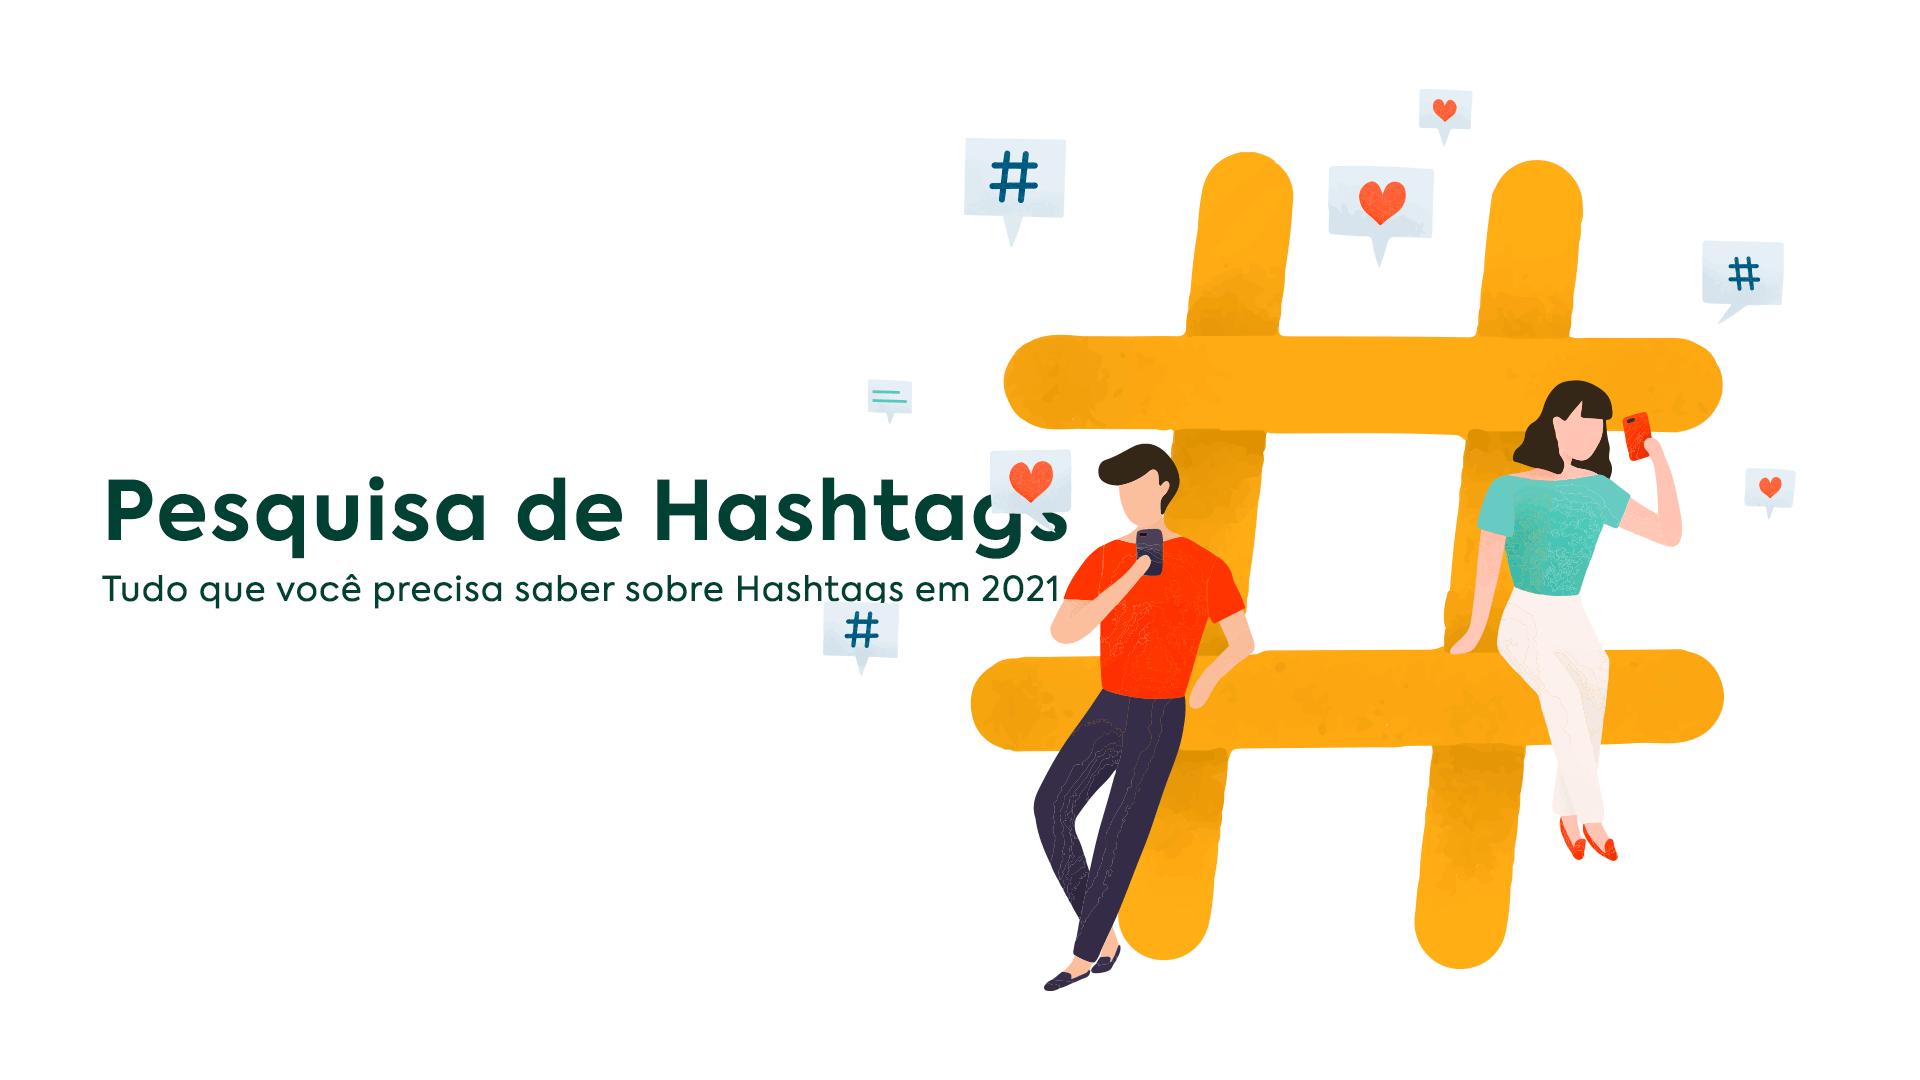 pesquisa de hashtags 2021